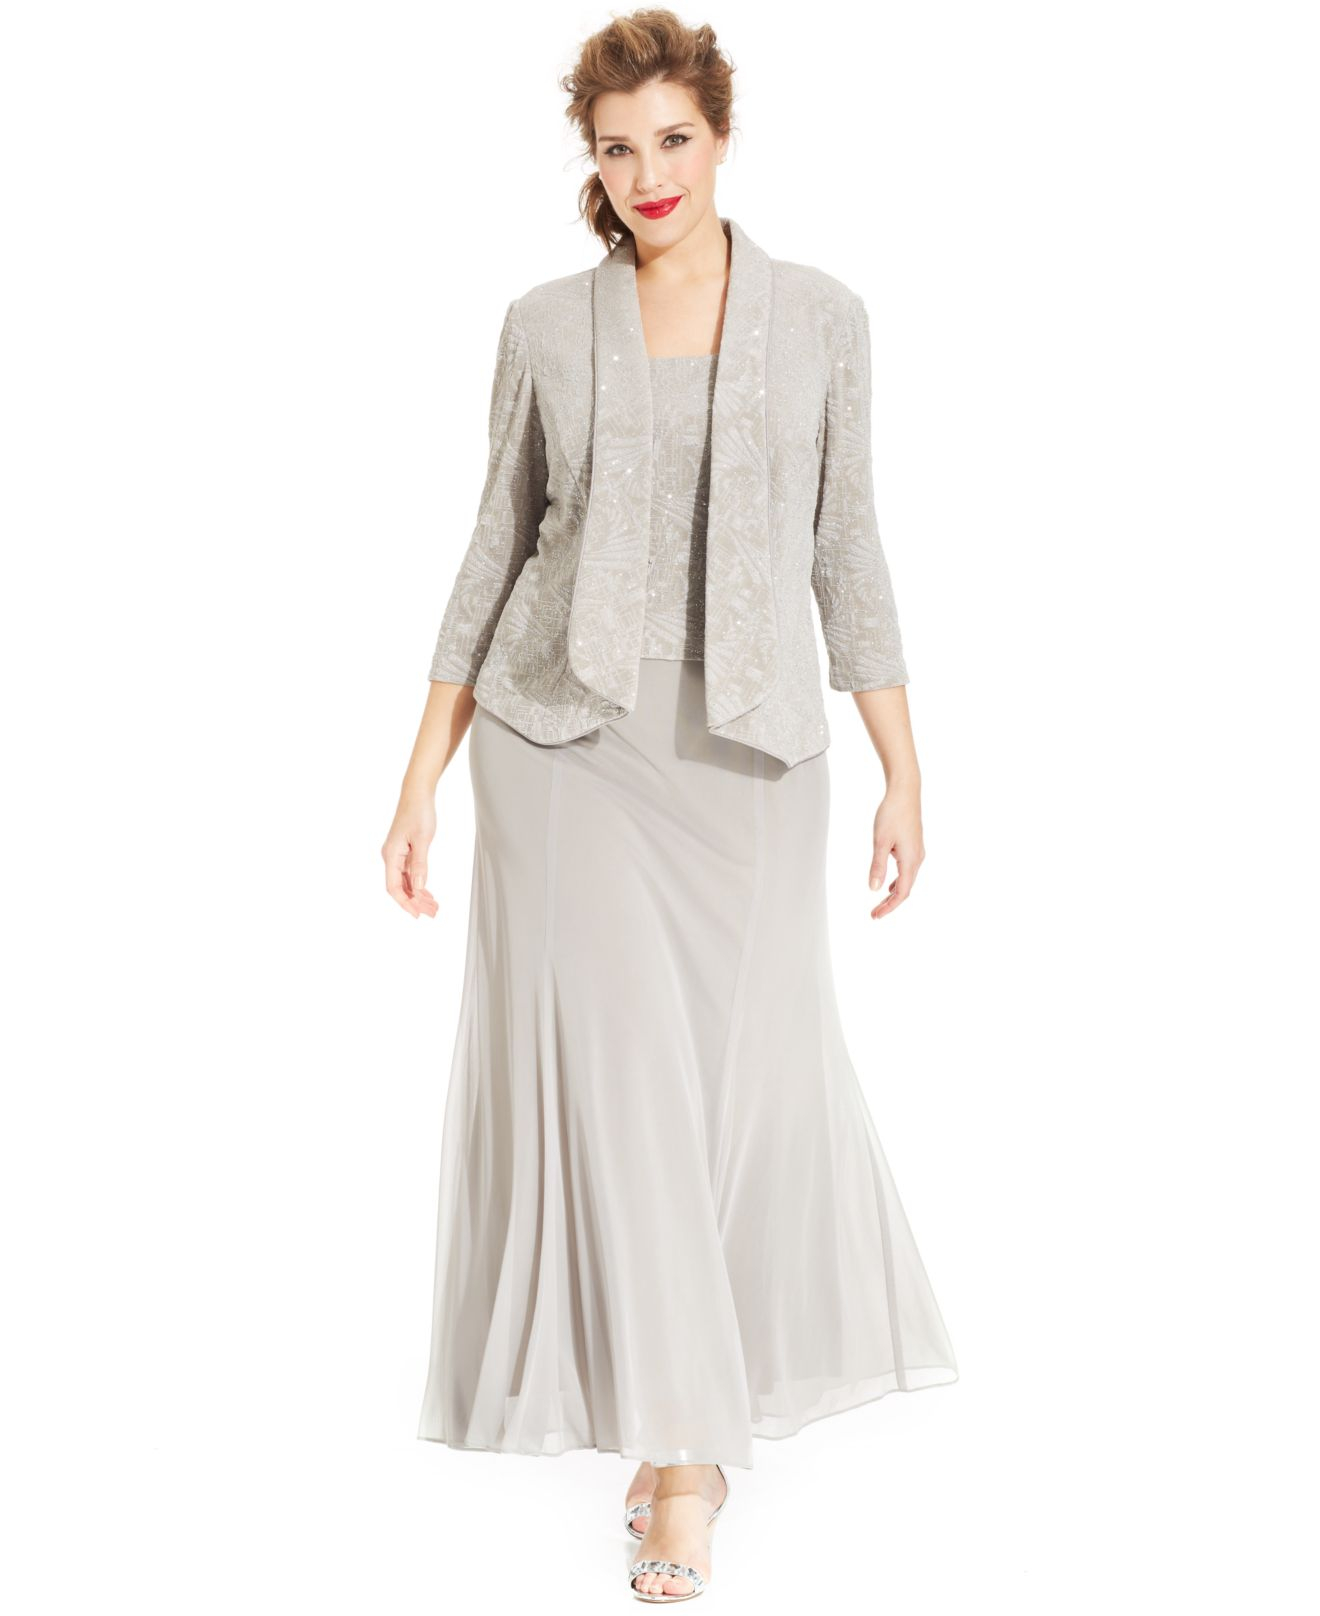 3dffa7b3ae8fd Lyst - Alex Evenings Plus Size Glitter Jacquard Dress And Jacket in Gray